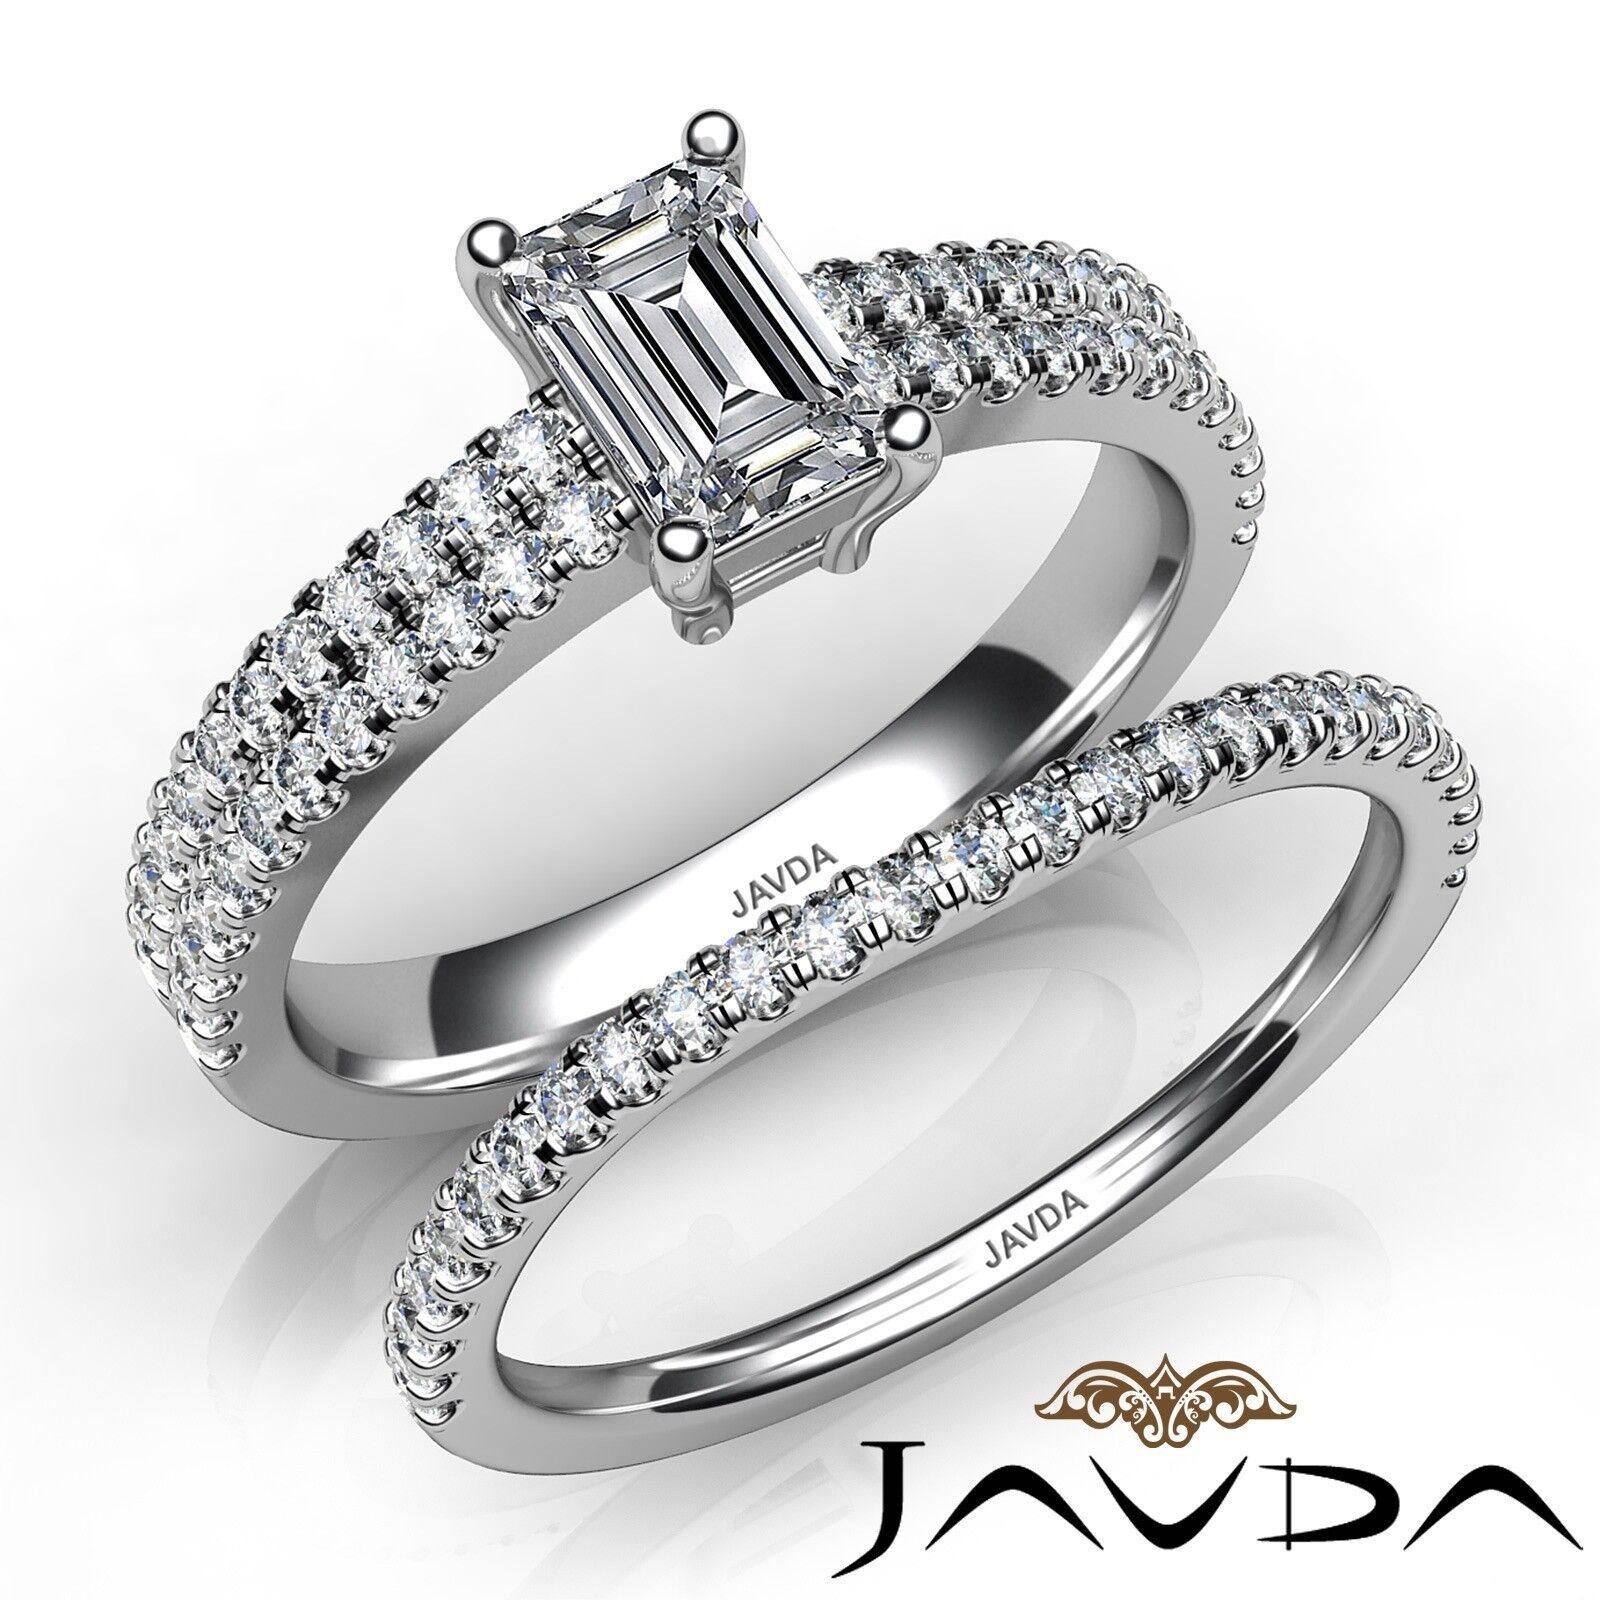 1.6ctw Double Shank Bridal Set Emerald Diamond Engagement Ring GIA G-VS2 W Gold